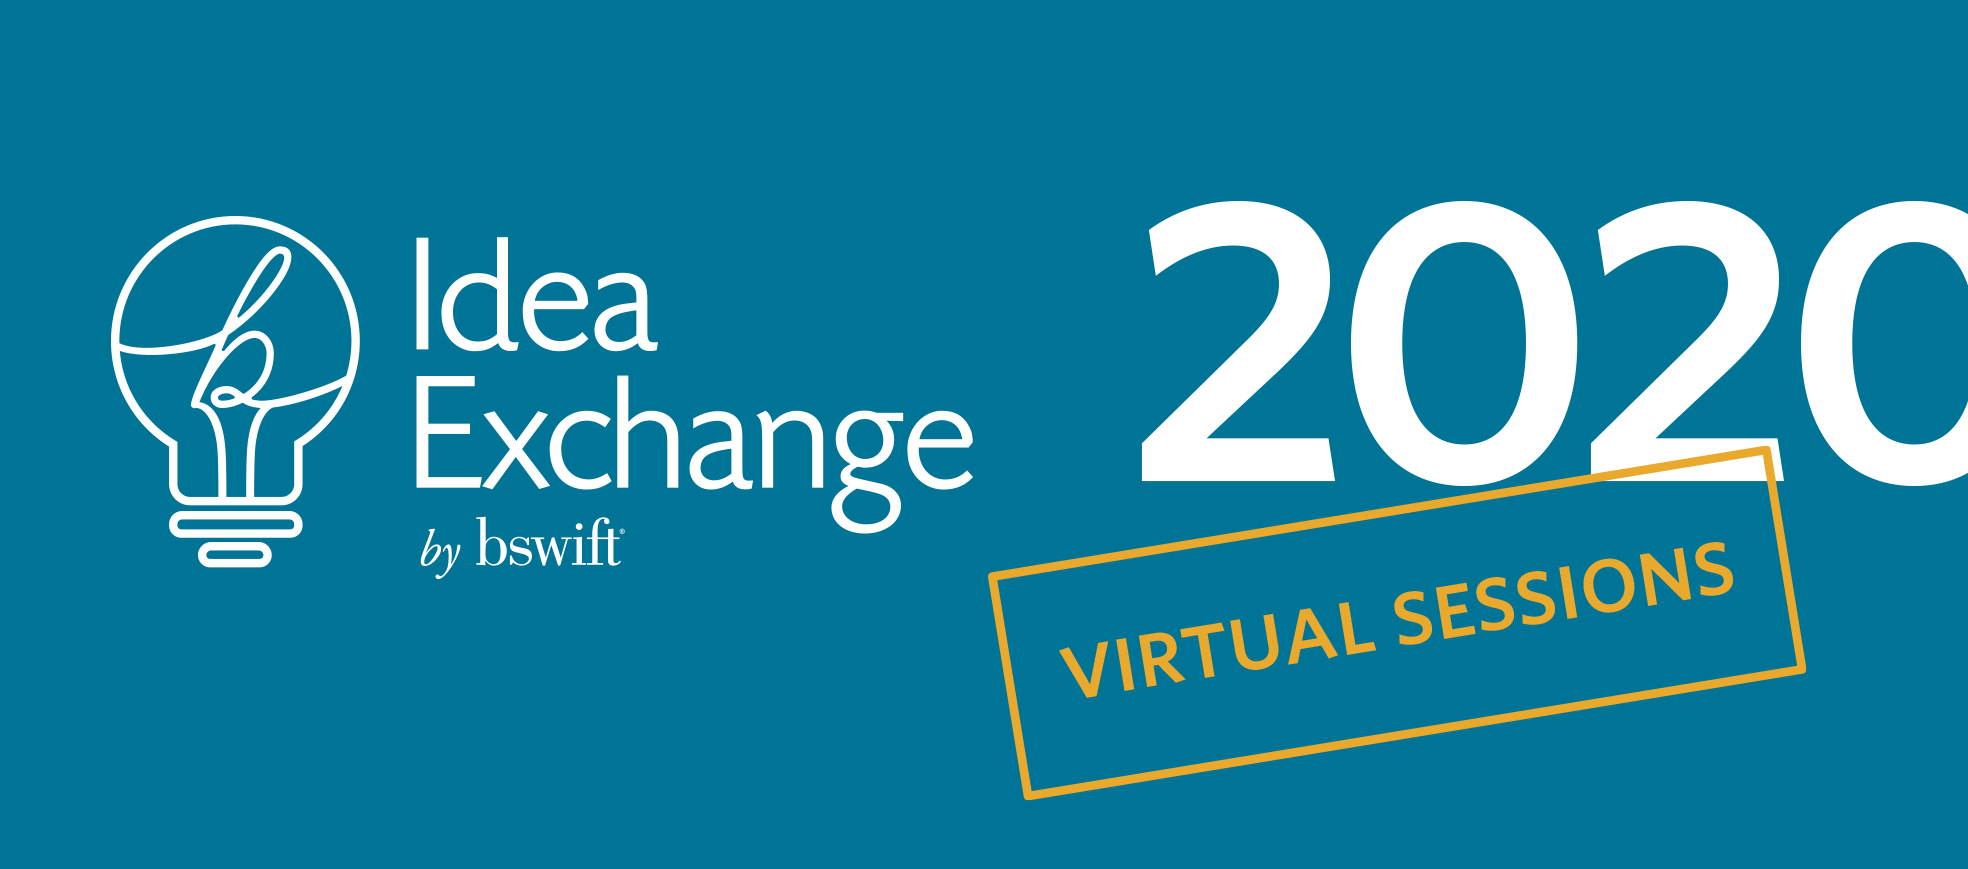 Idea Exchange Virtual Session Recap